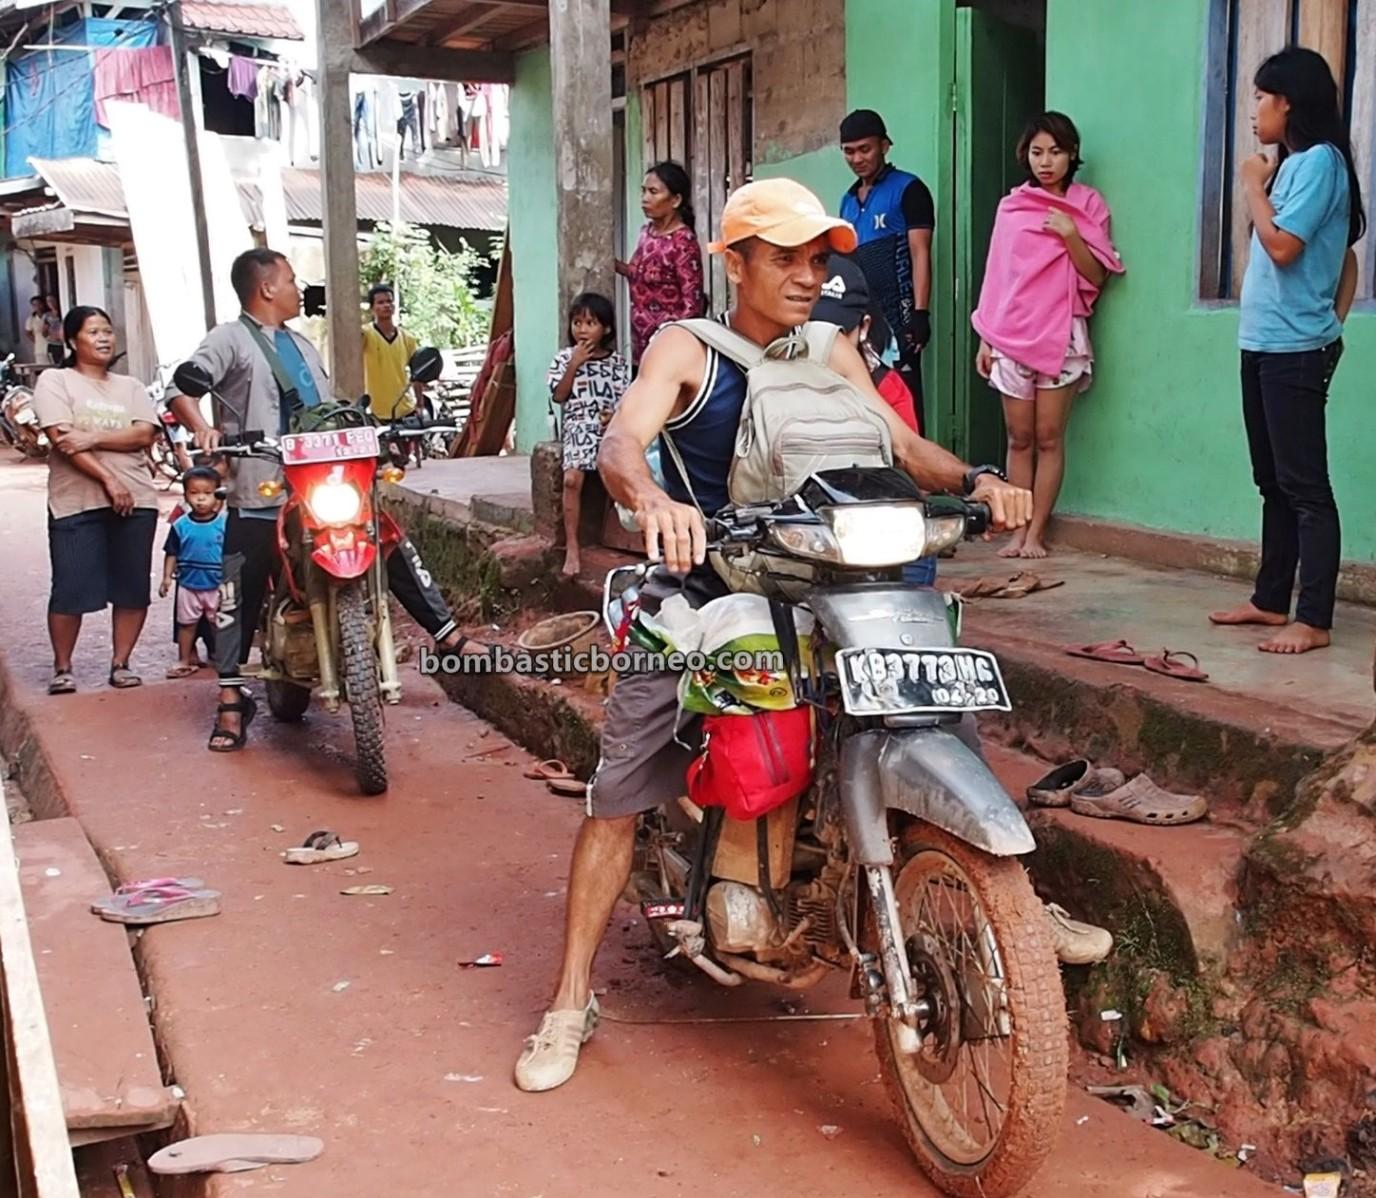 Dusun Tamong, adventure, authentic, village, backpackers, exploration, Gawai Padi, Indonesia, Kalimantan Barat, Bengkayang, native, Dayak Bidayuh, tribe, travel guide, cross border, Borneo